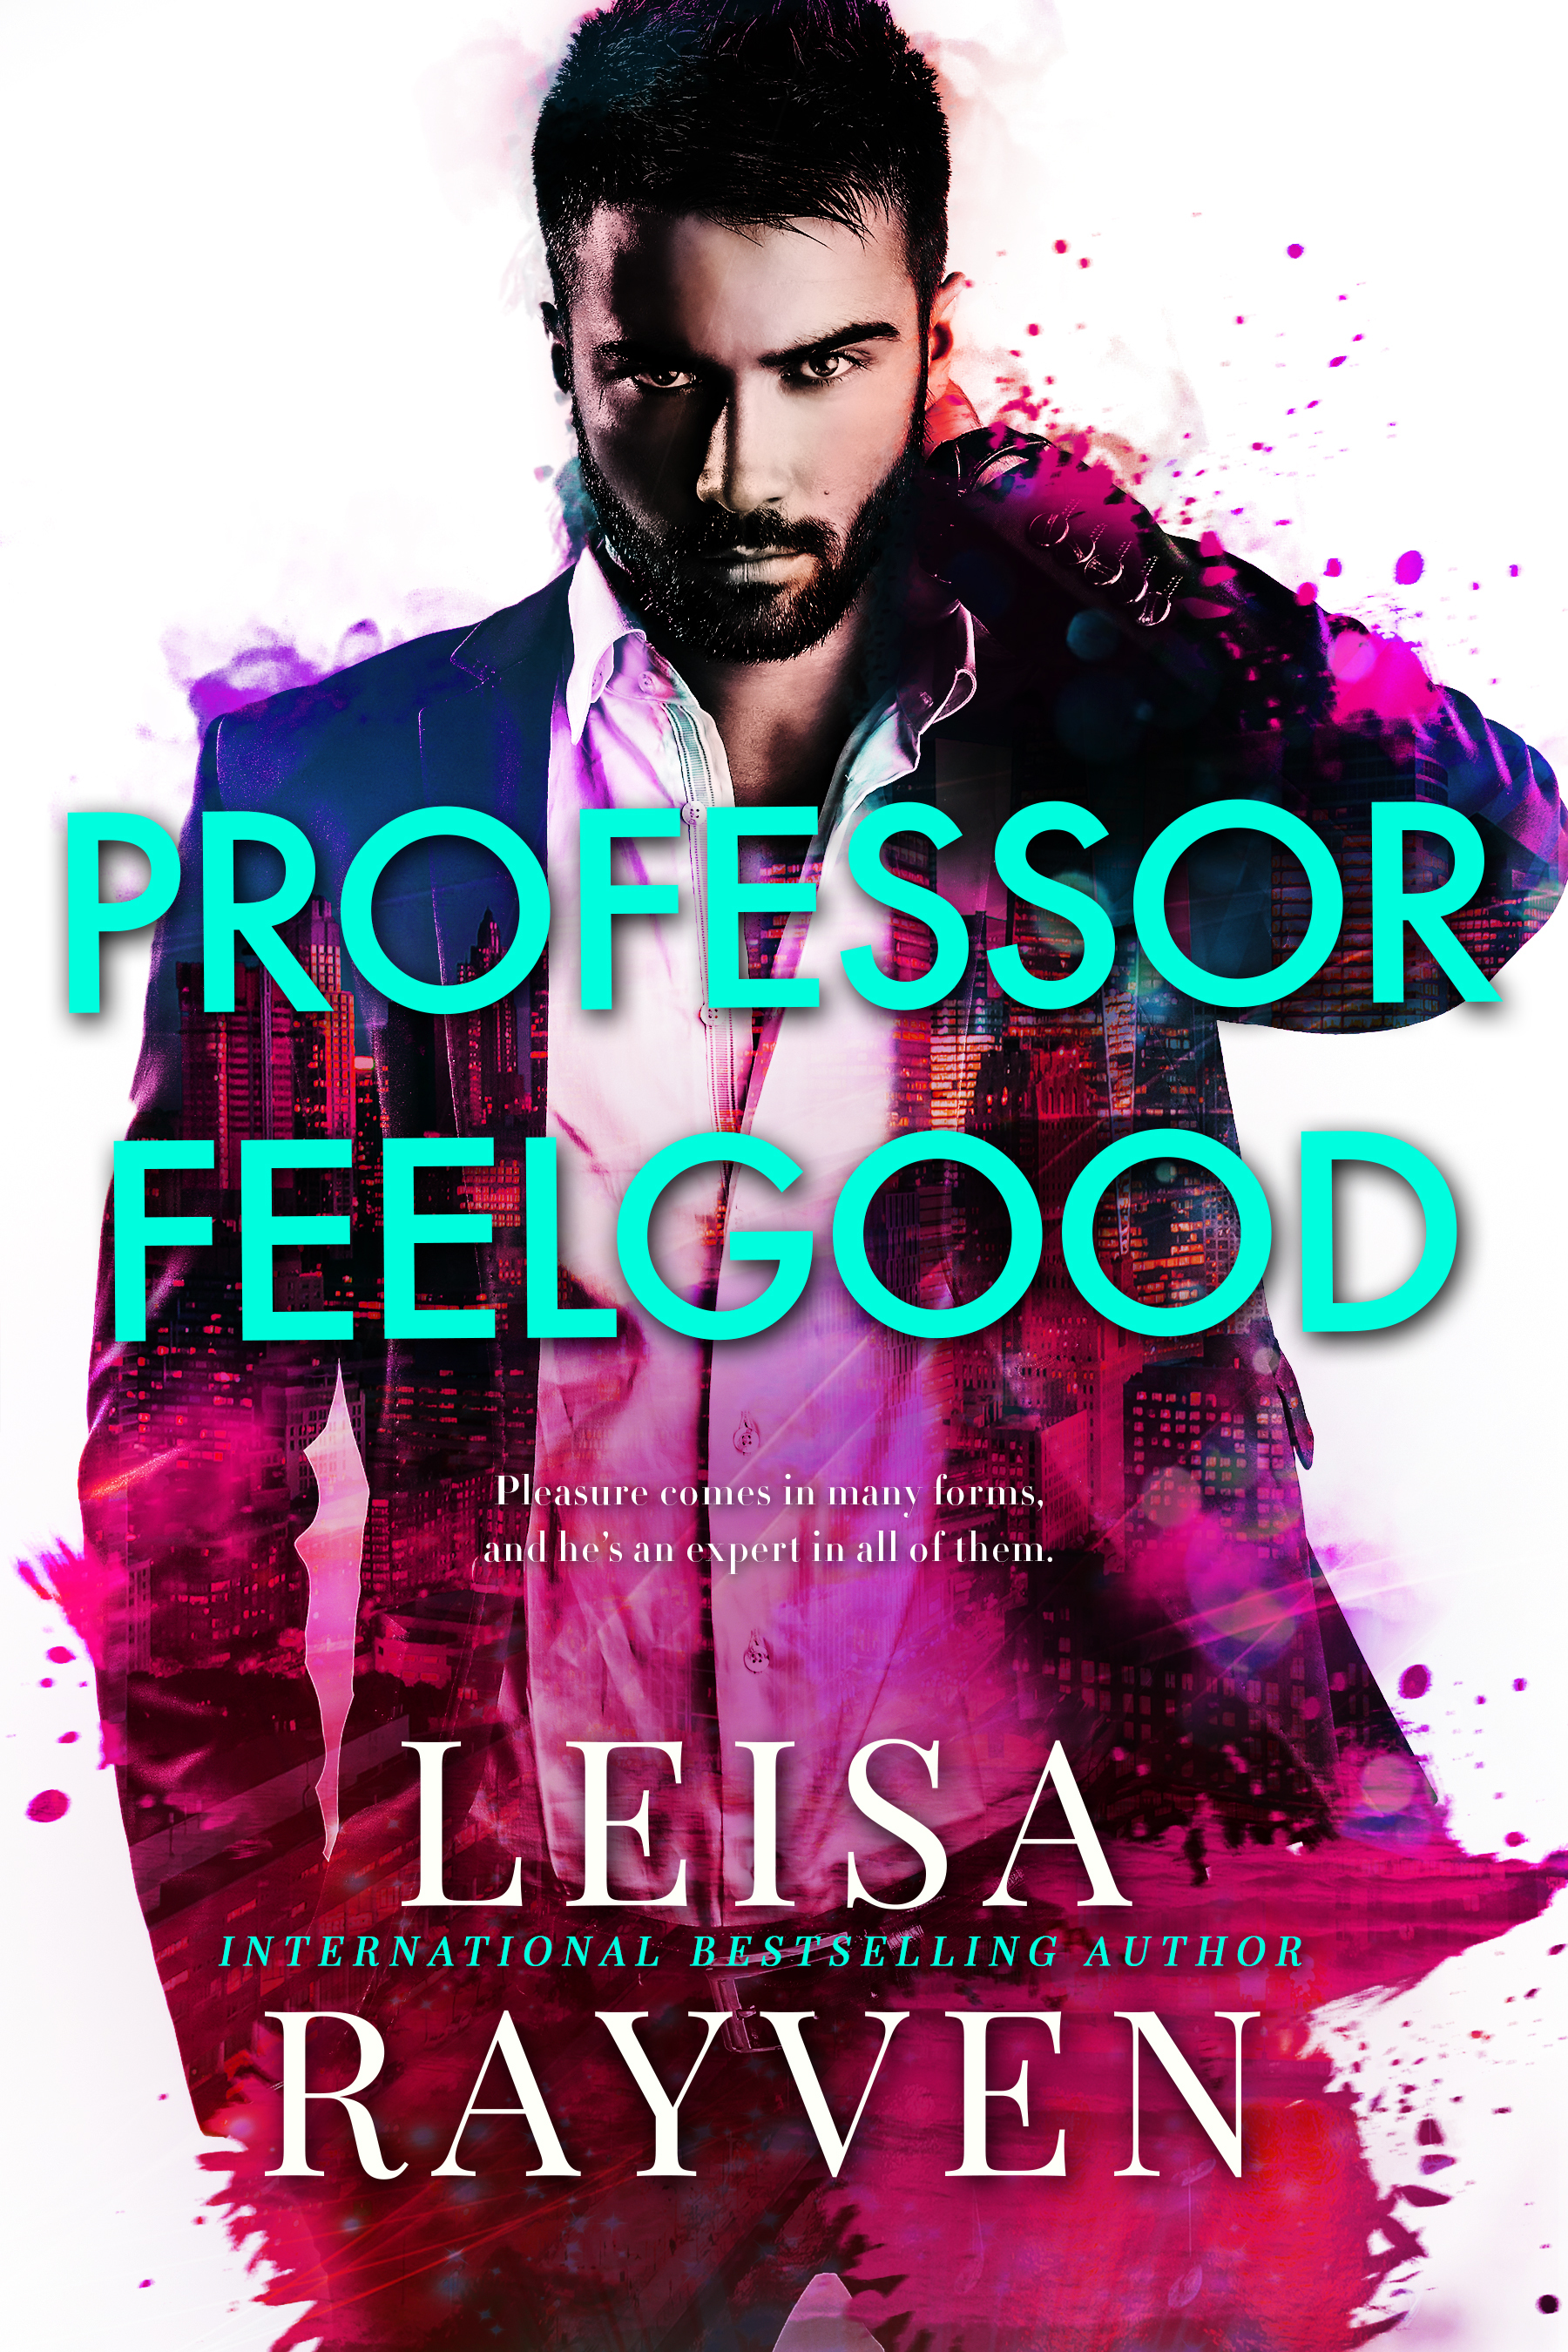 Leisa Rayven - Masters of Love 2 - Professor Feelgood